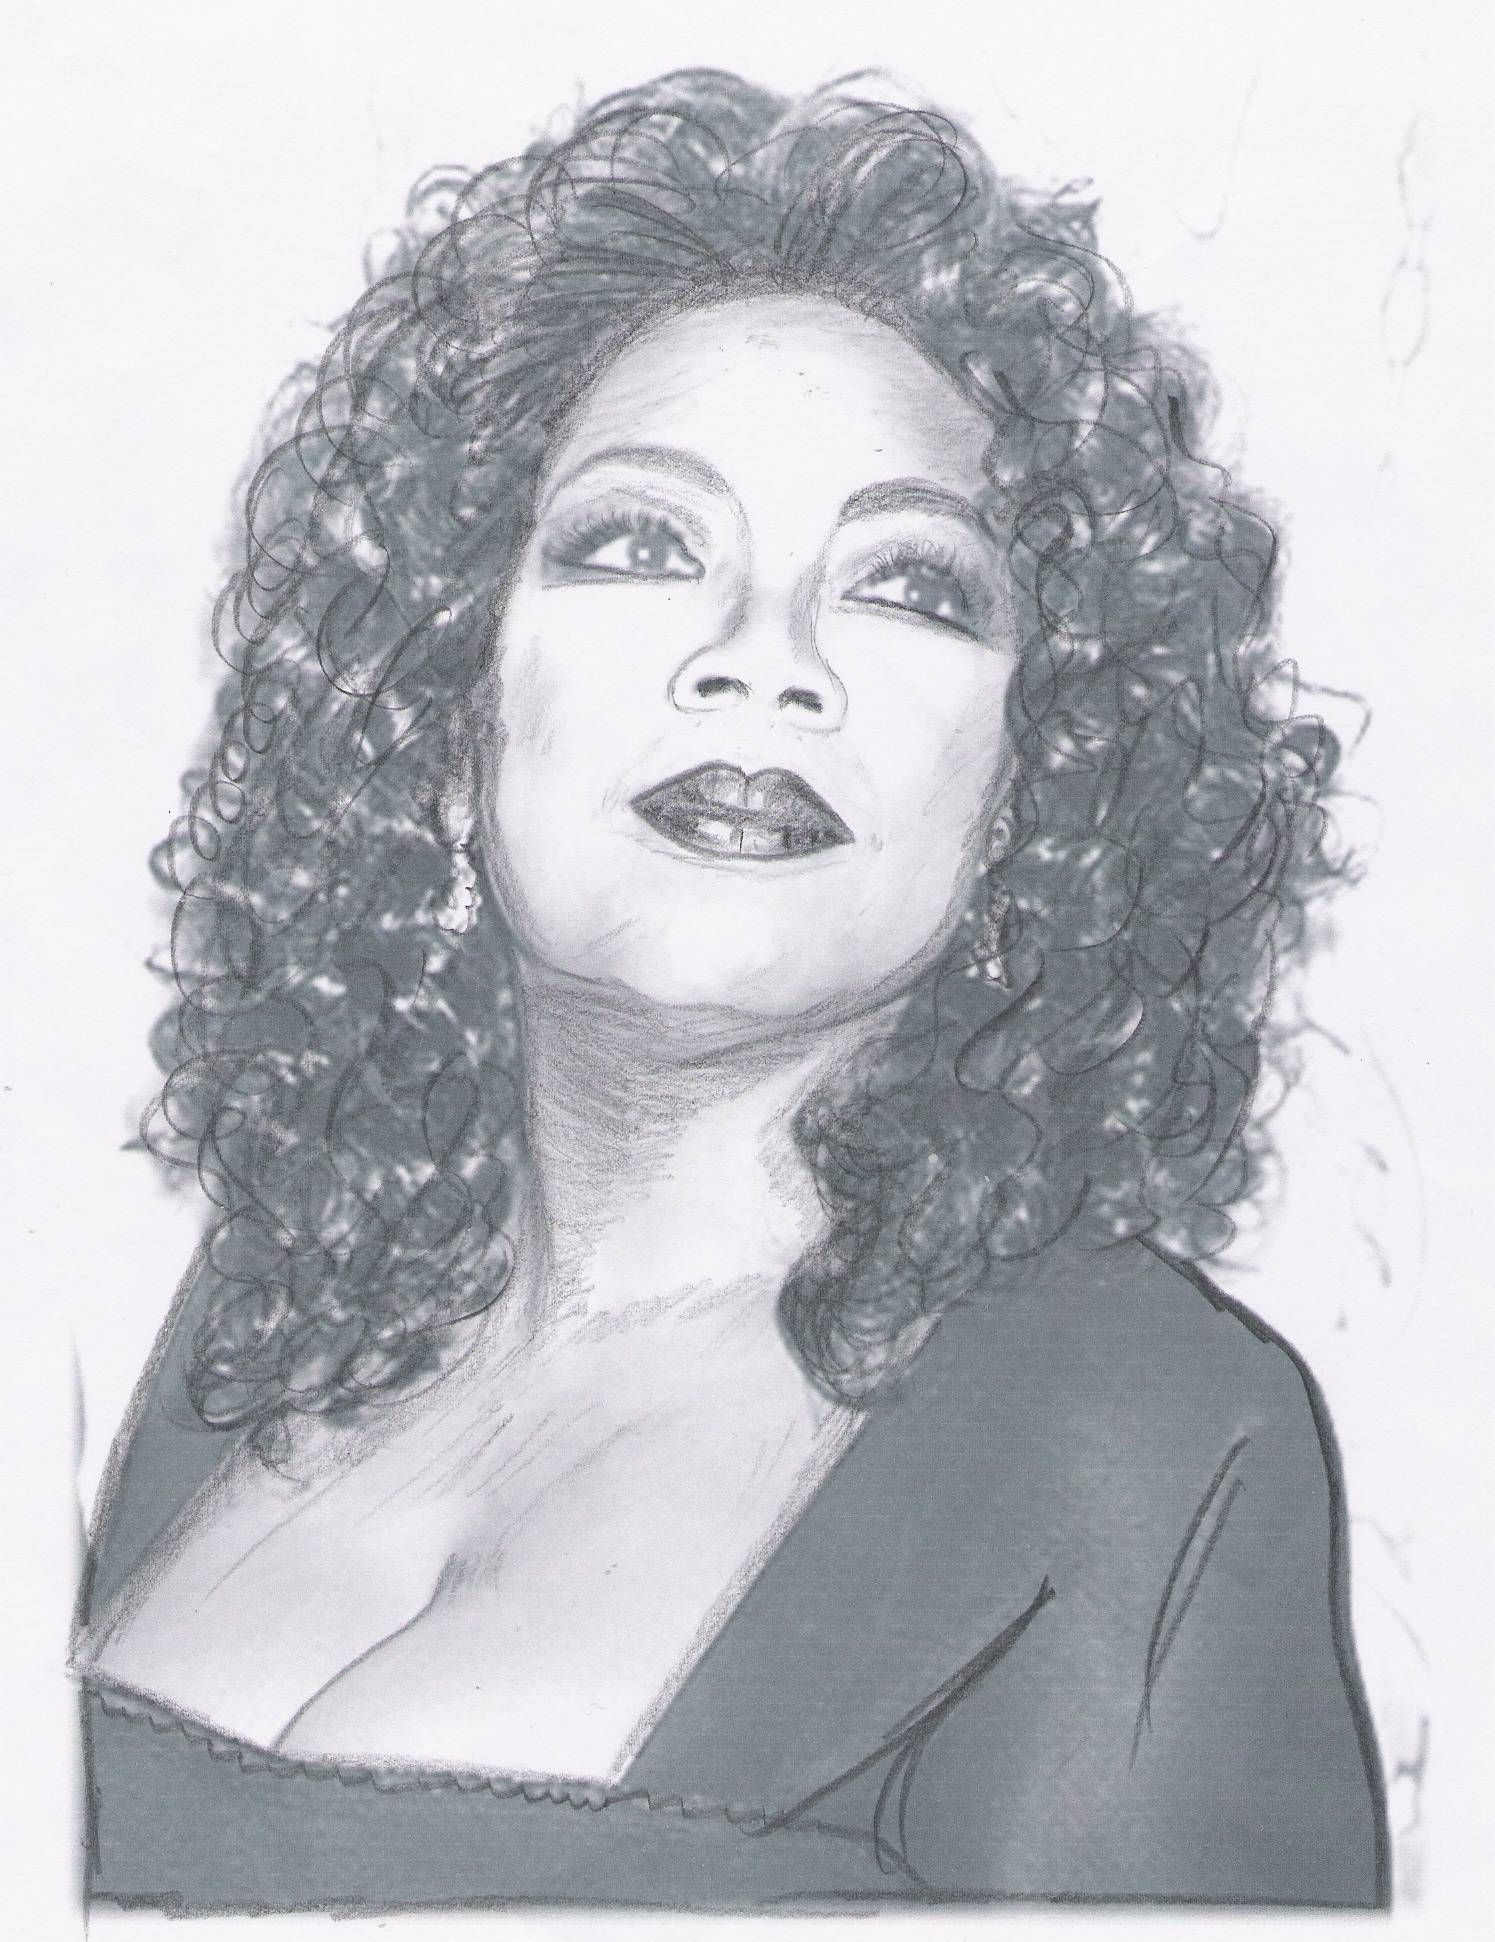 oprah winfrey my drawing oprah winfrey art and oprah oprah winfrey